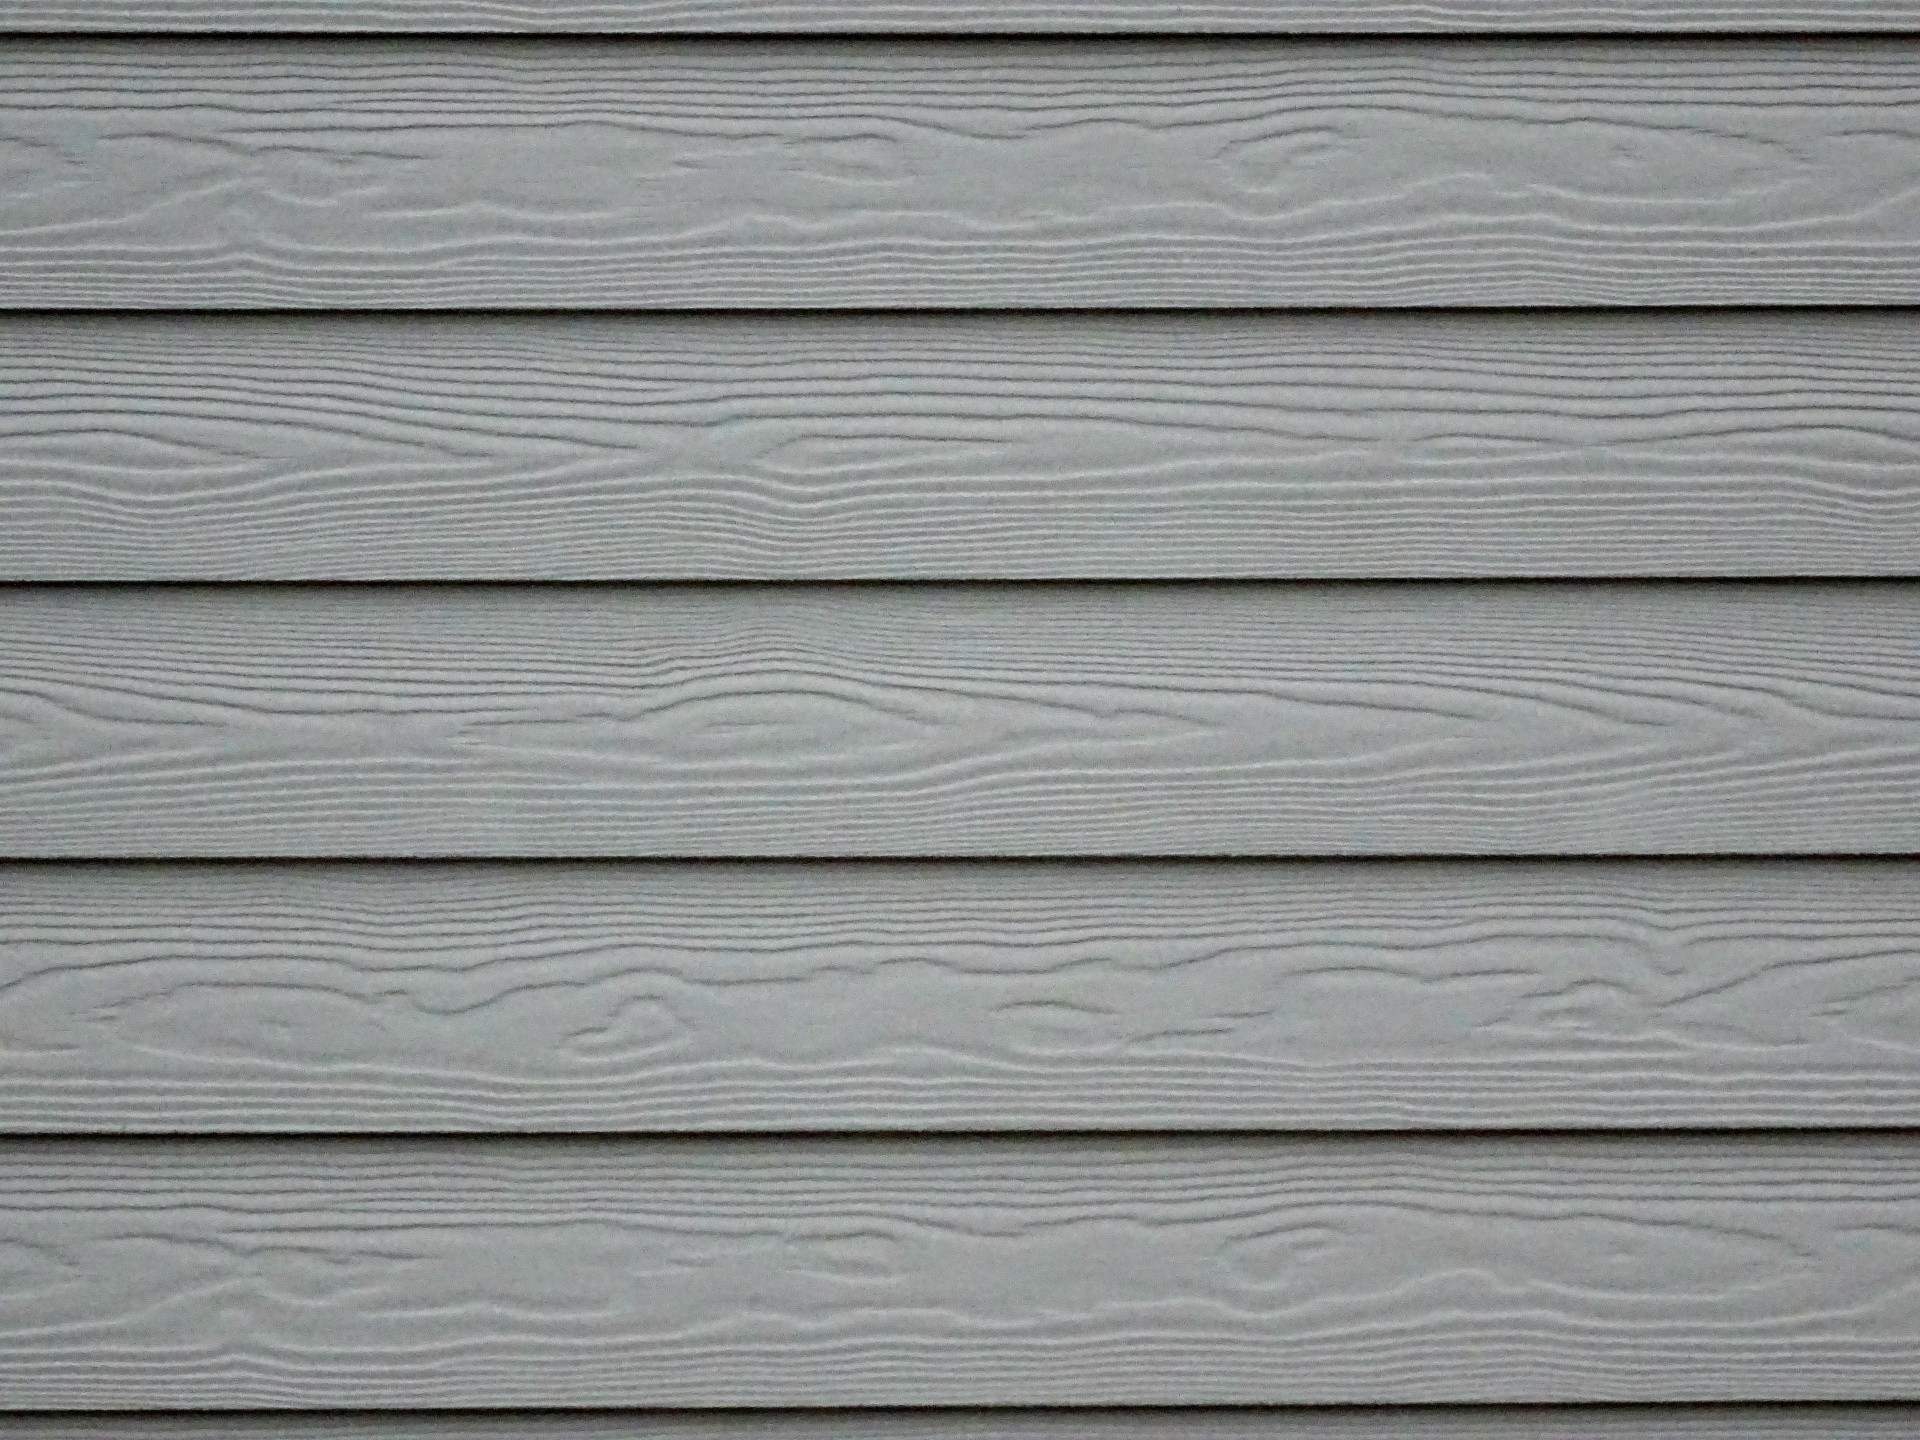 Gray Wood Texture Wallpaper